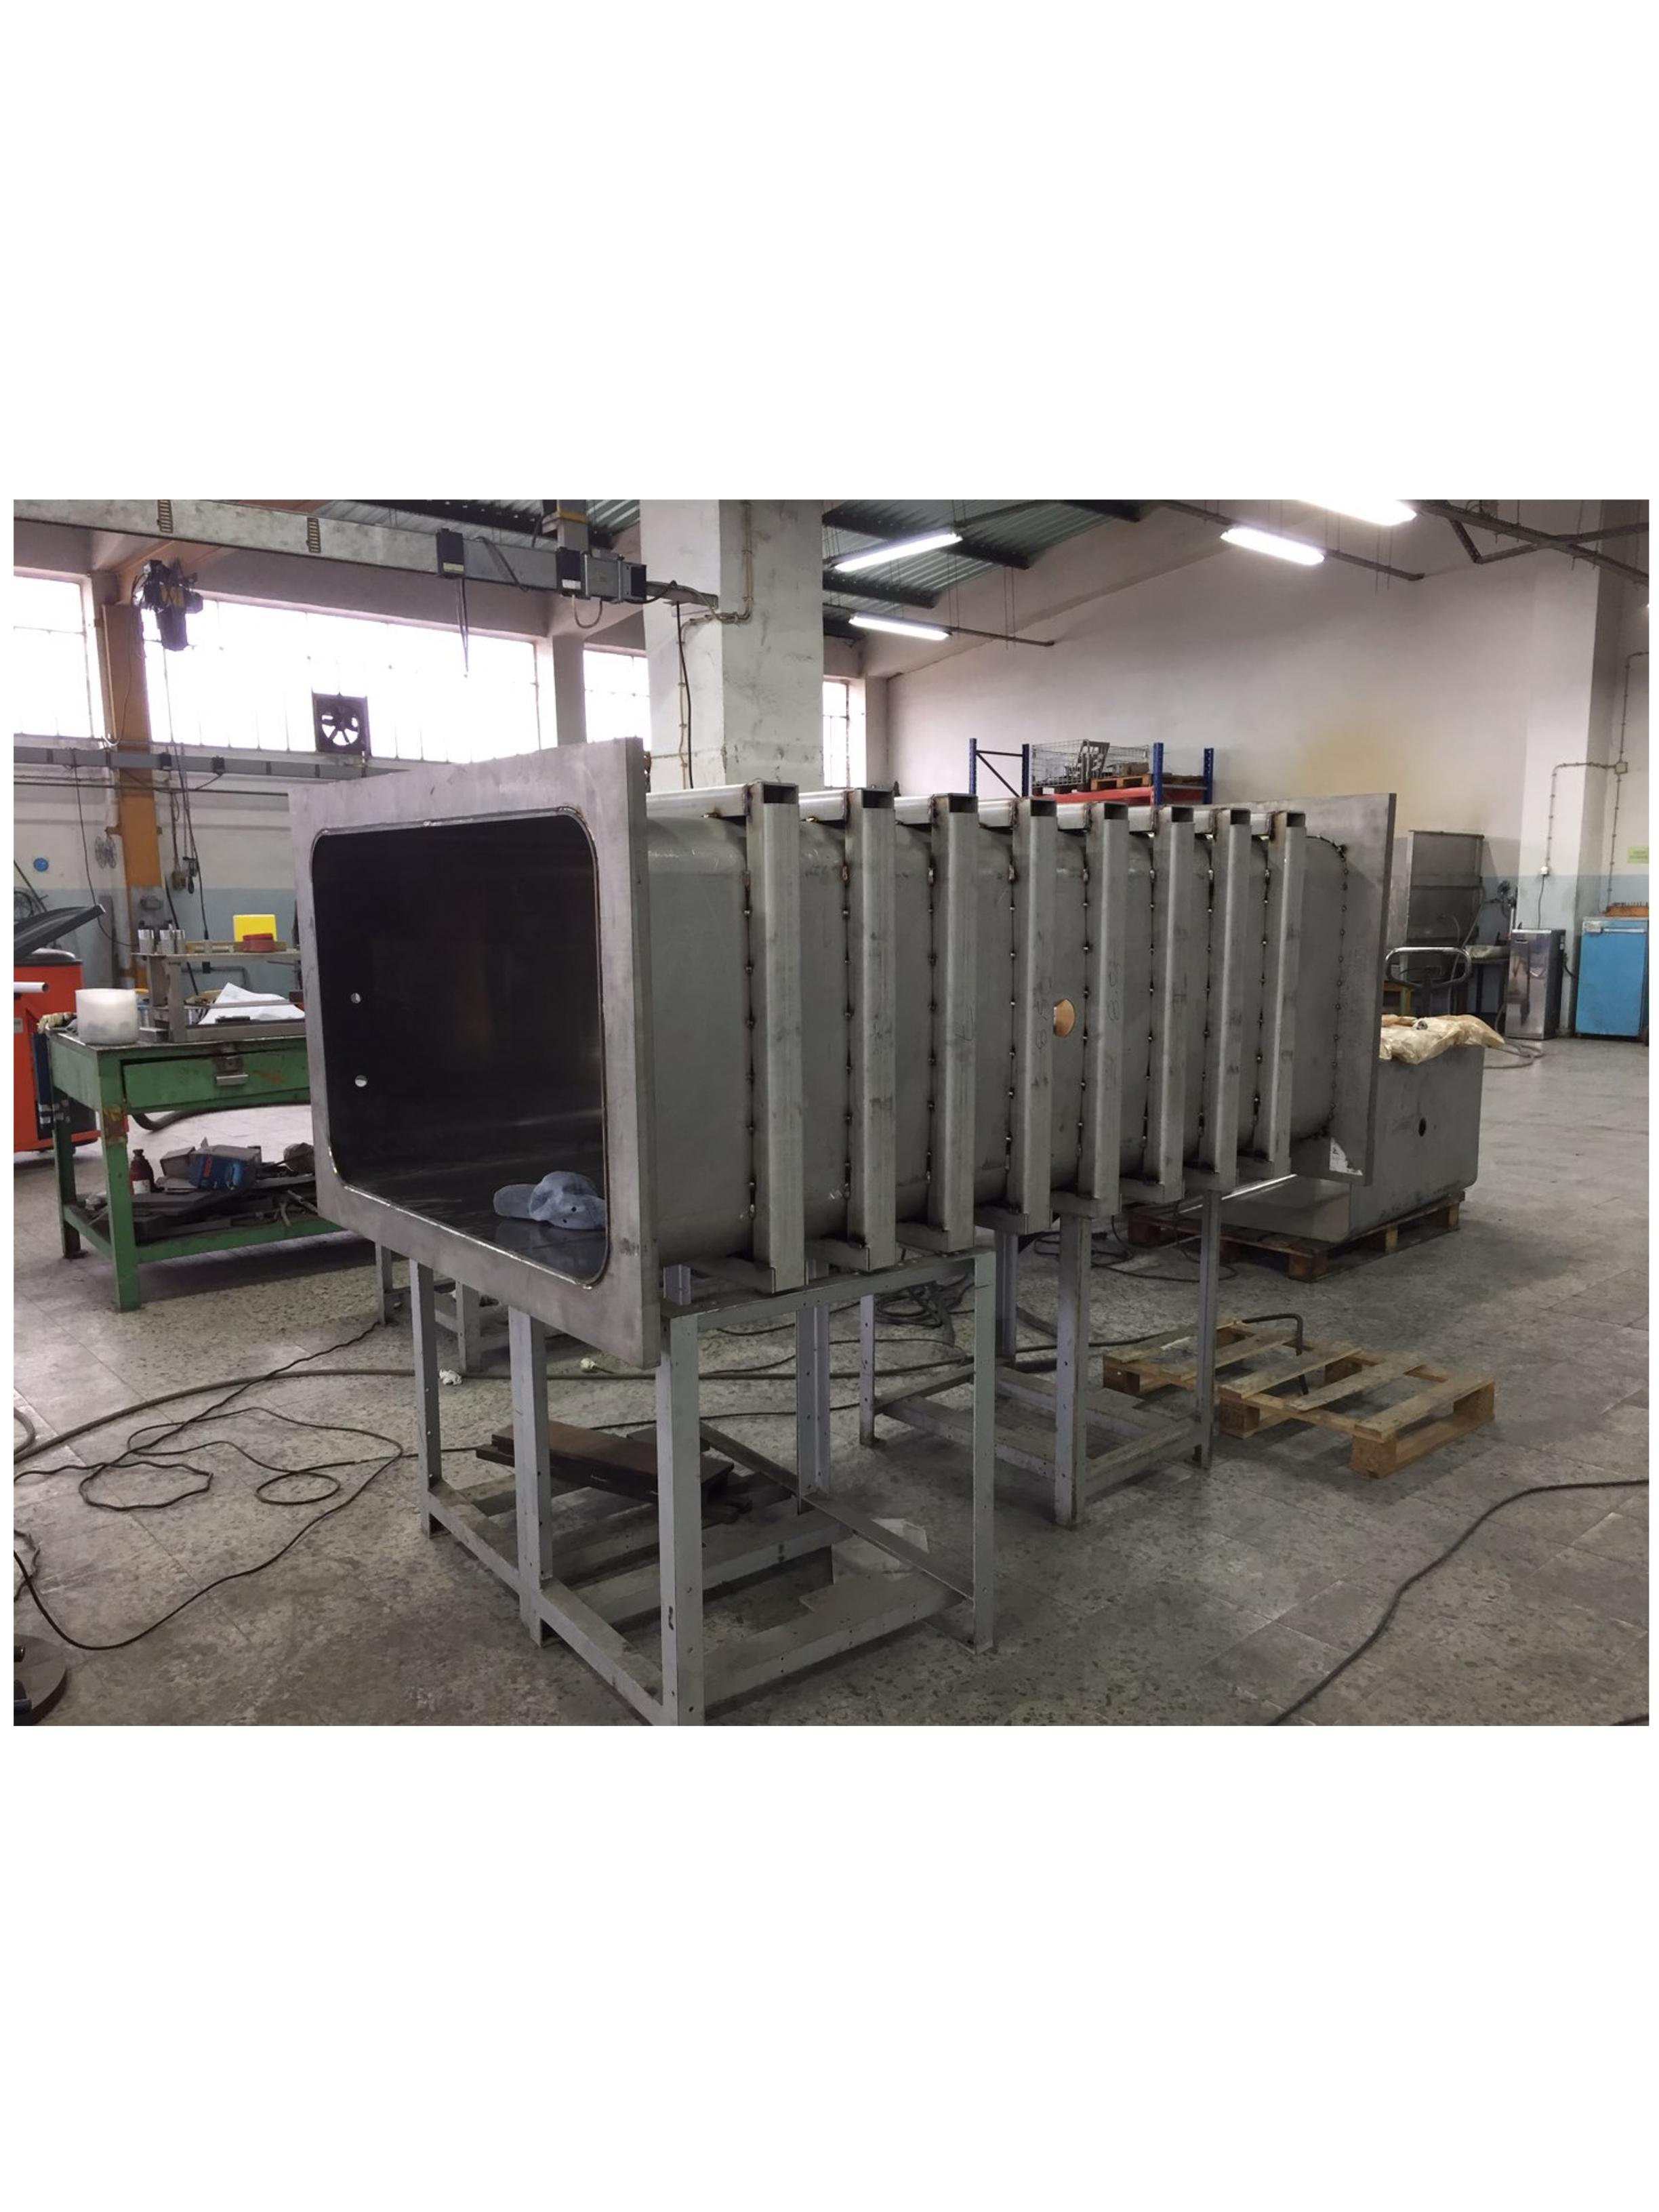 Steam sterilizer AJC